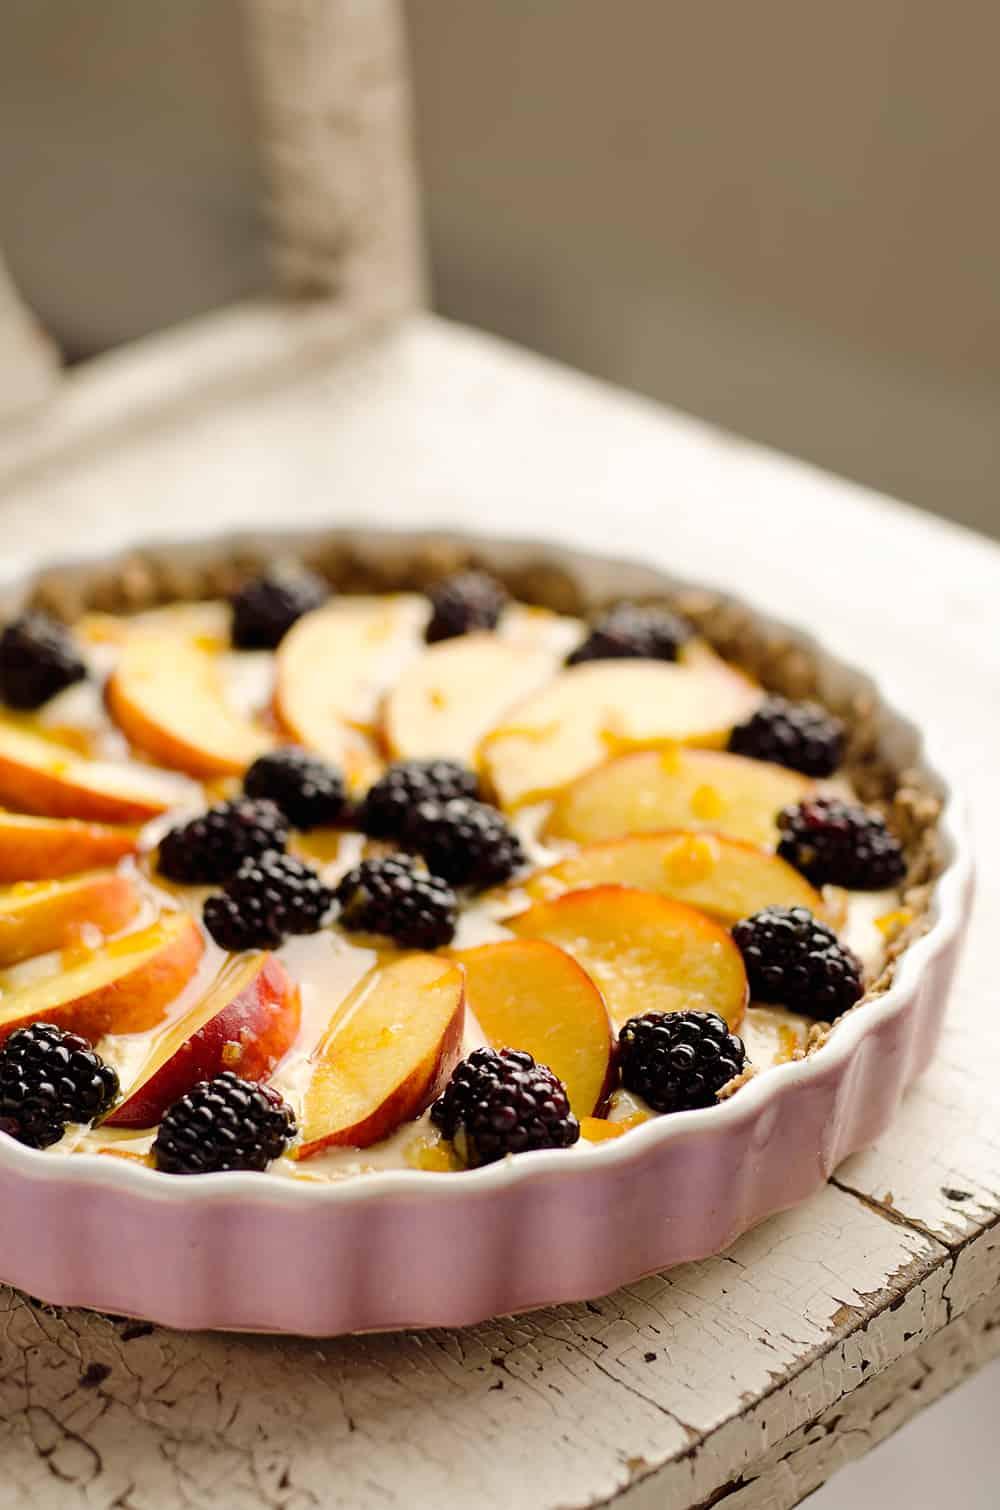 ... orange, cream cheese and Greek yogurt layer and topped with fresh